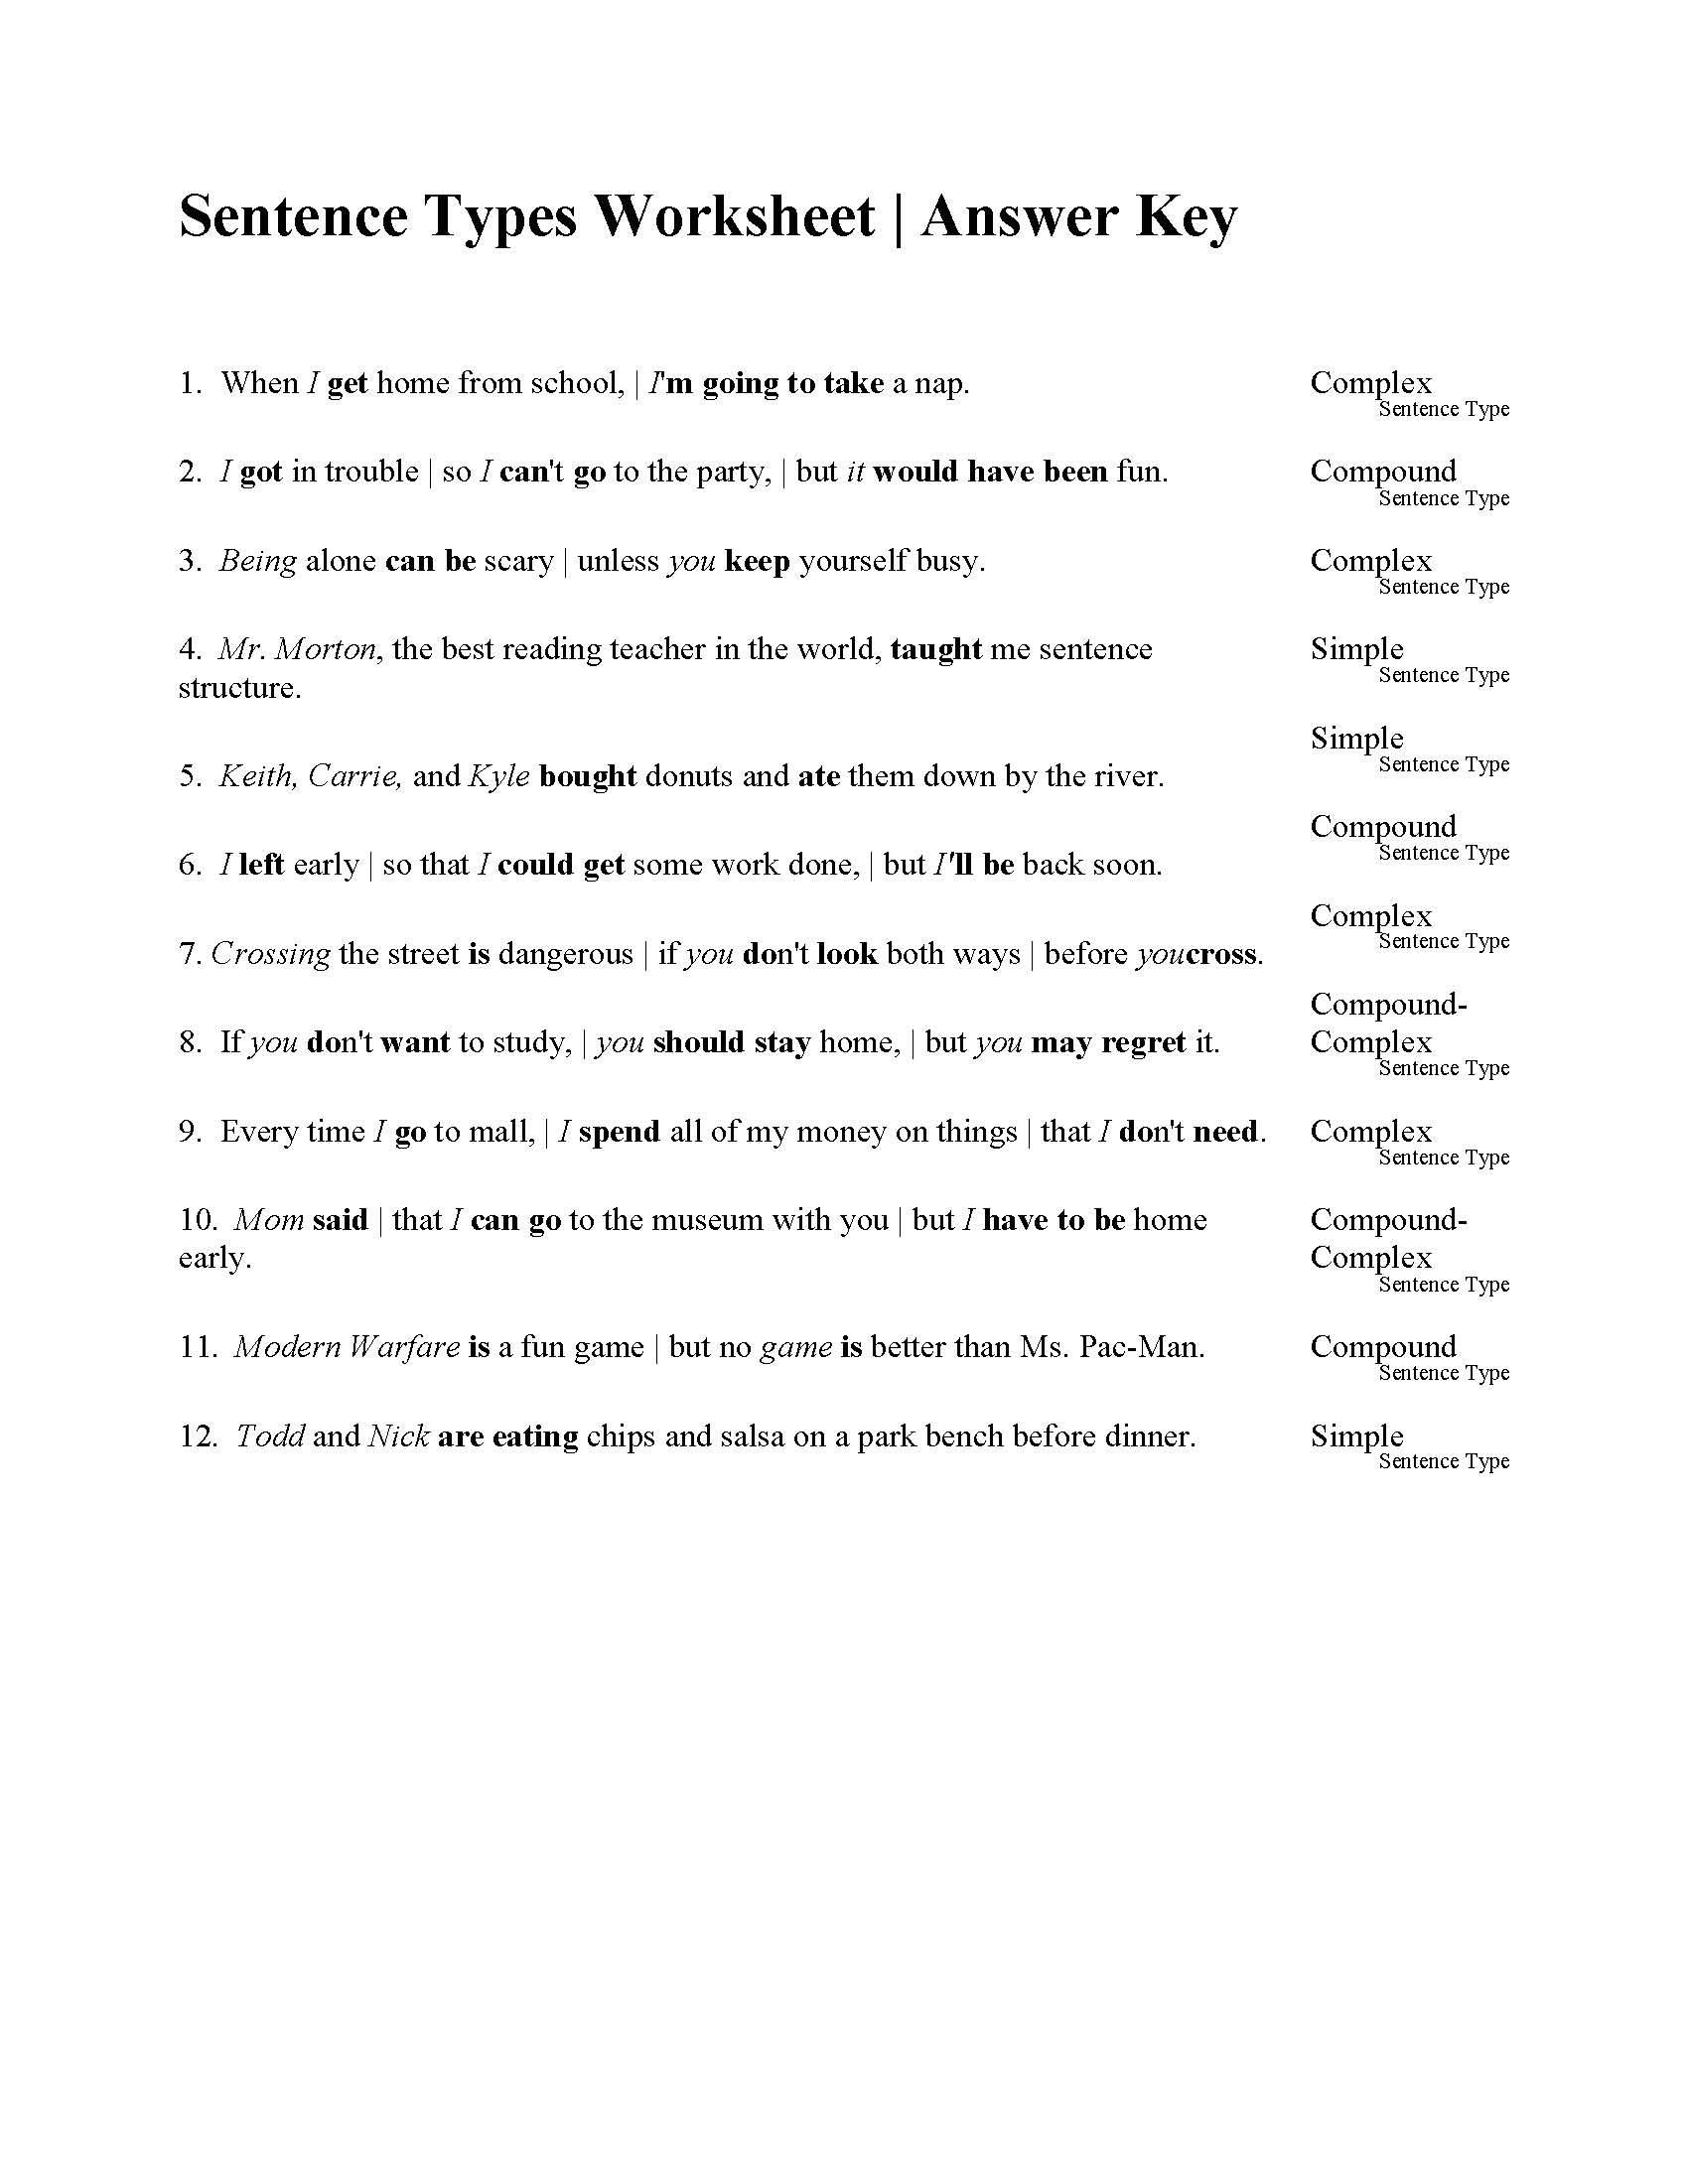 Science World Worksheet Answers Sentences Types Worksheet Answers Sentence Patterns